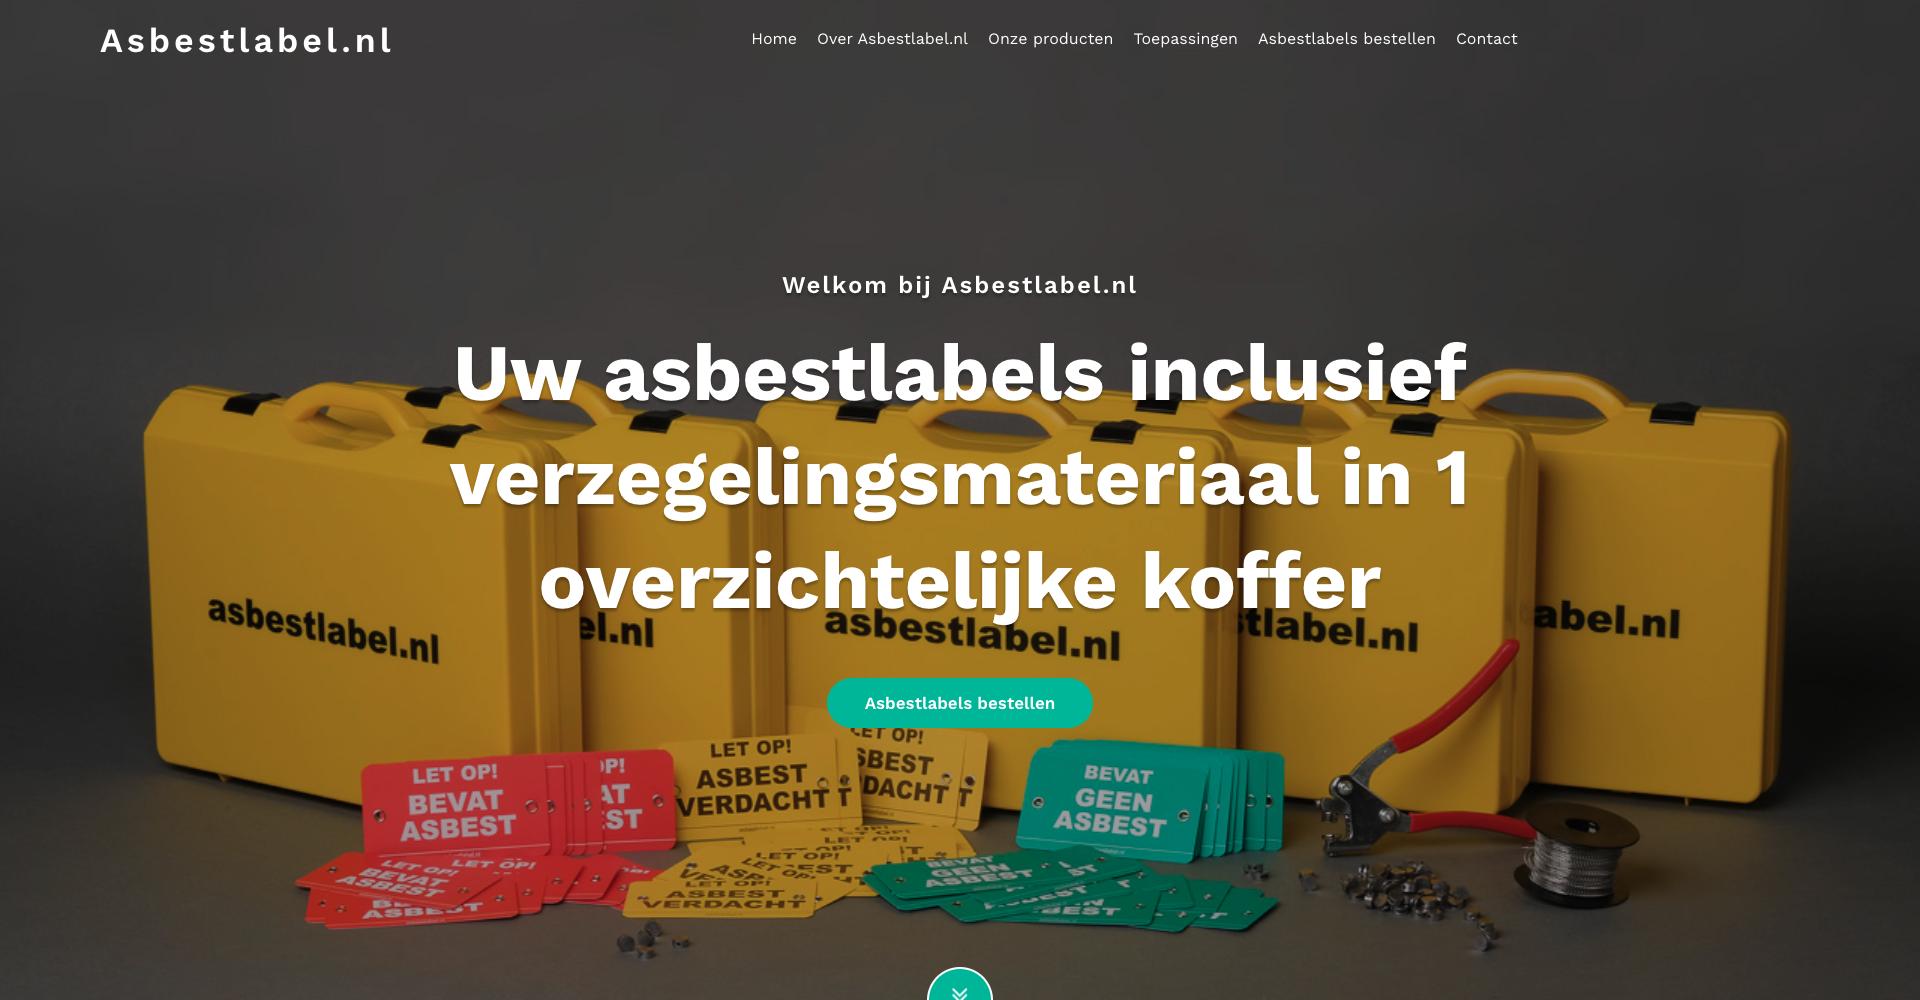 Asbestlabel.nl